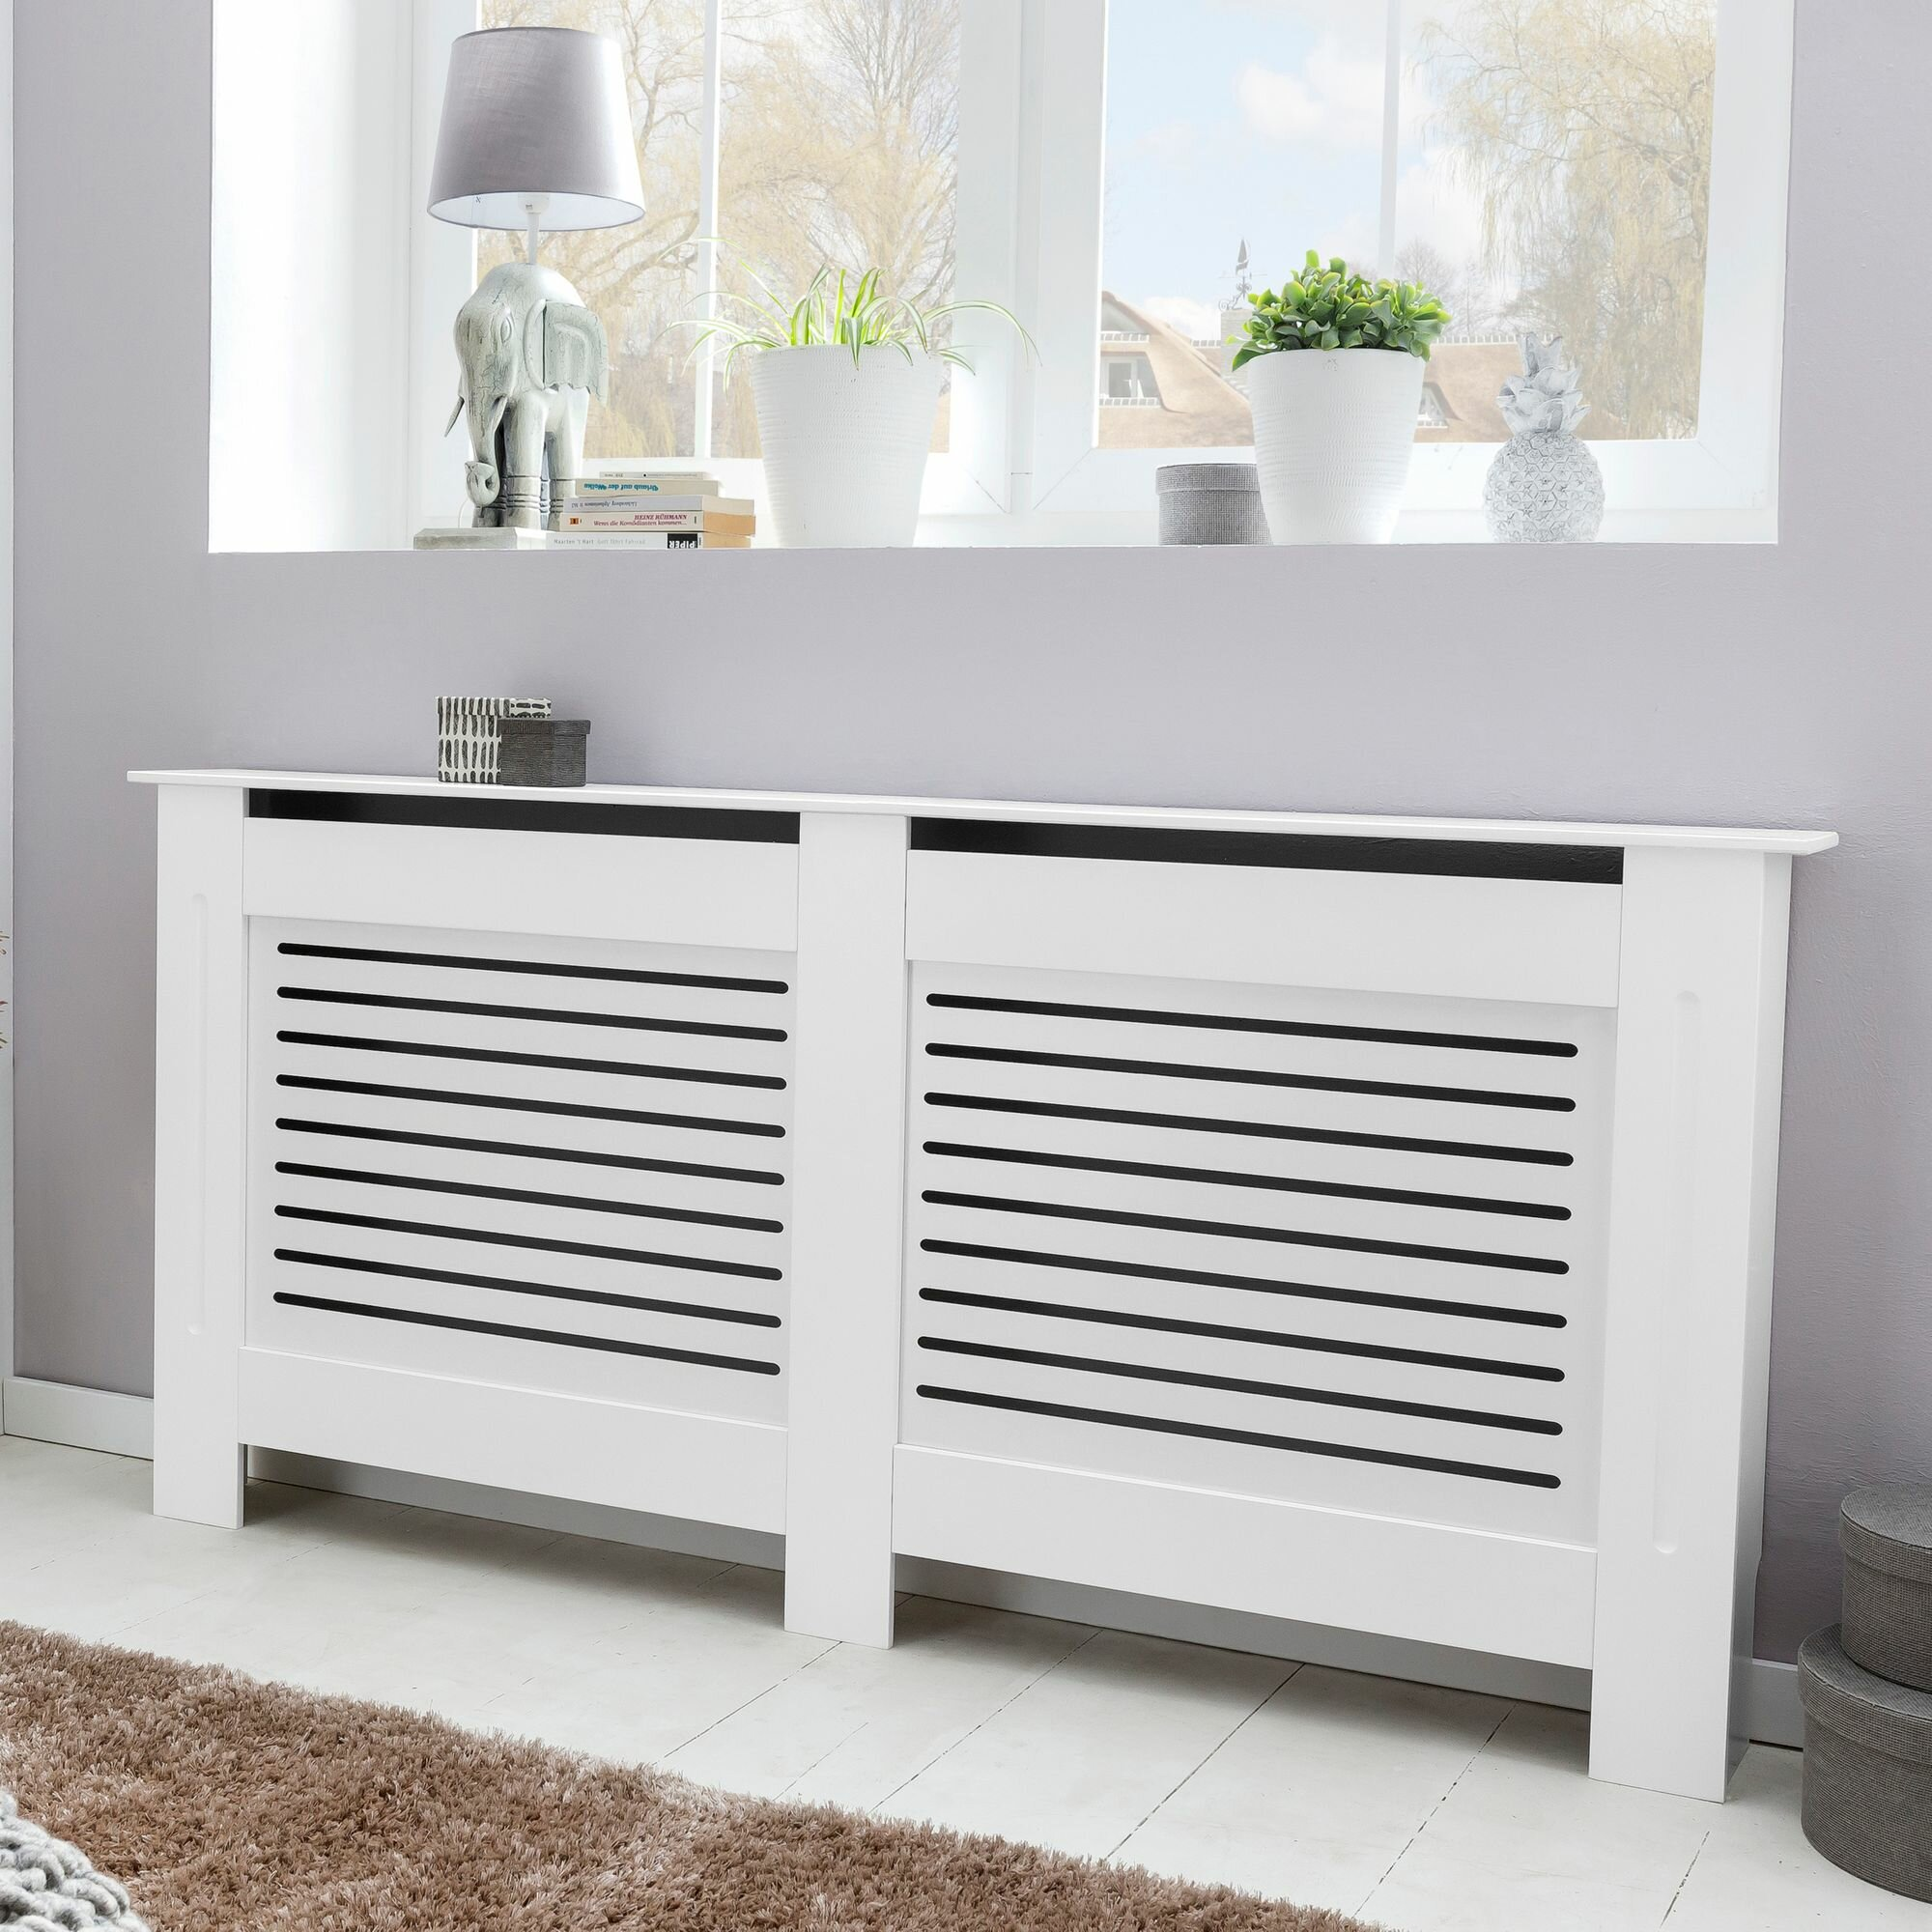 Belfry Heating Janette Medium Radiator Cover | Wayfair.co.uk